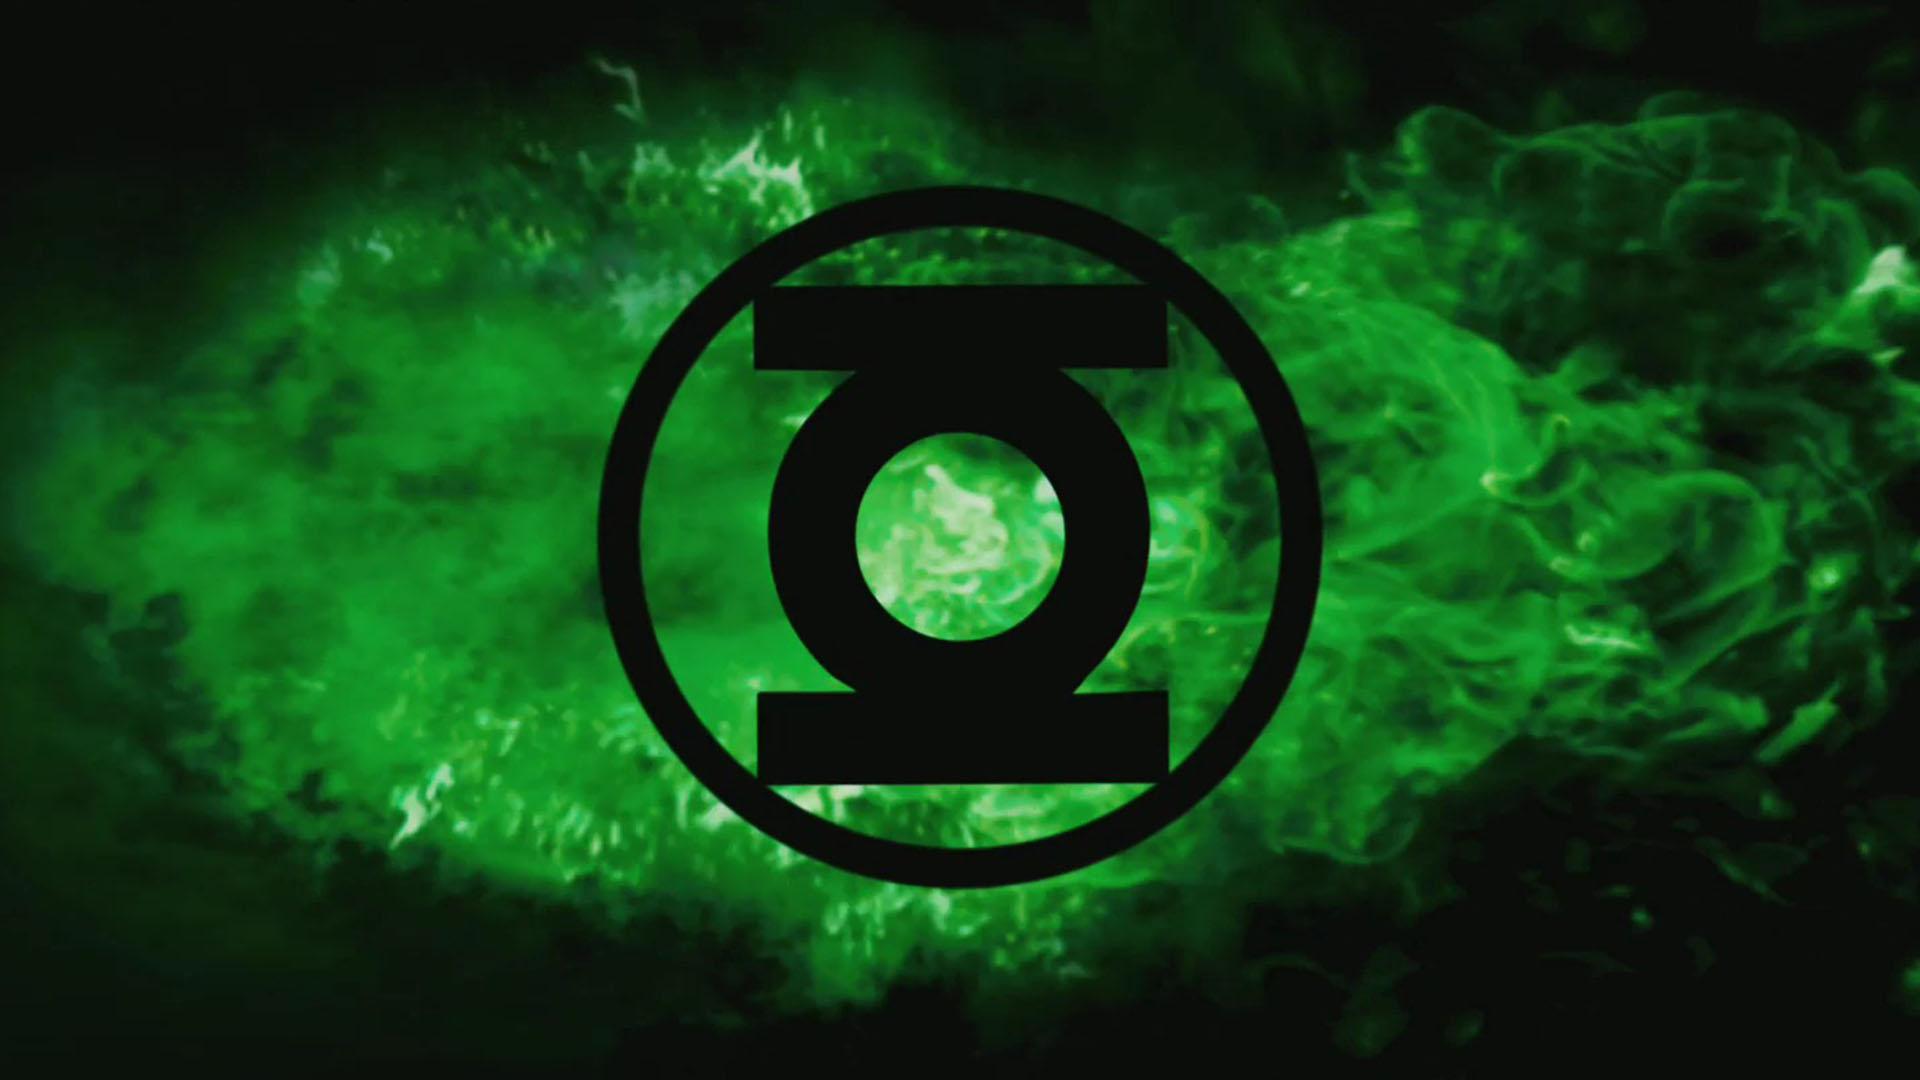 green lantern 1920x1080